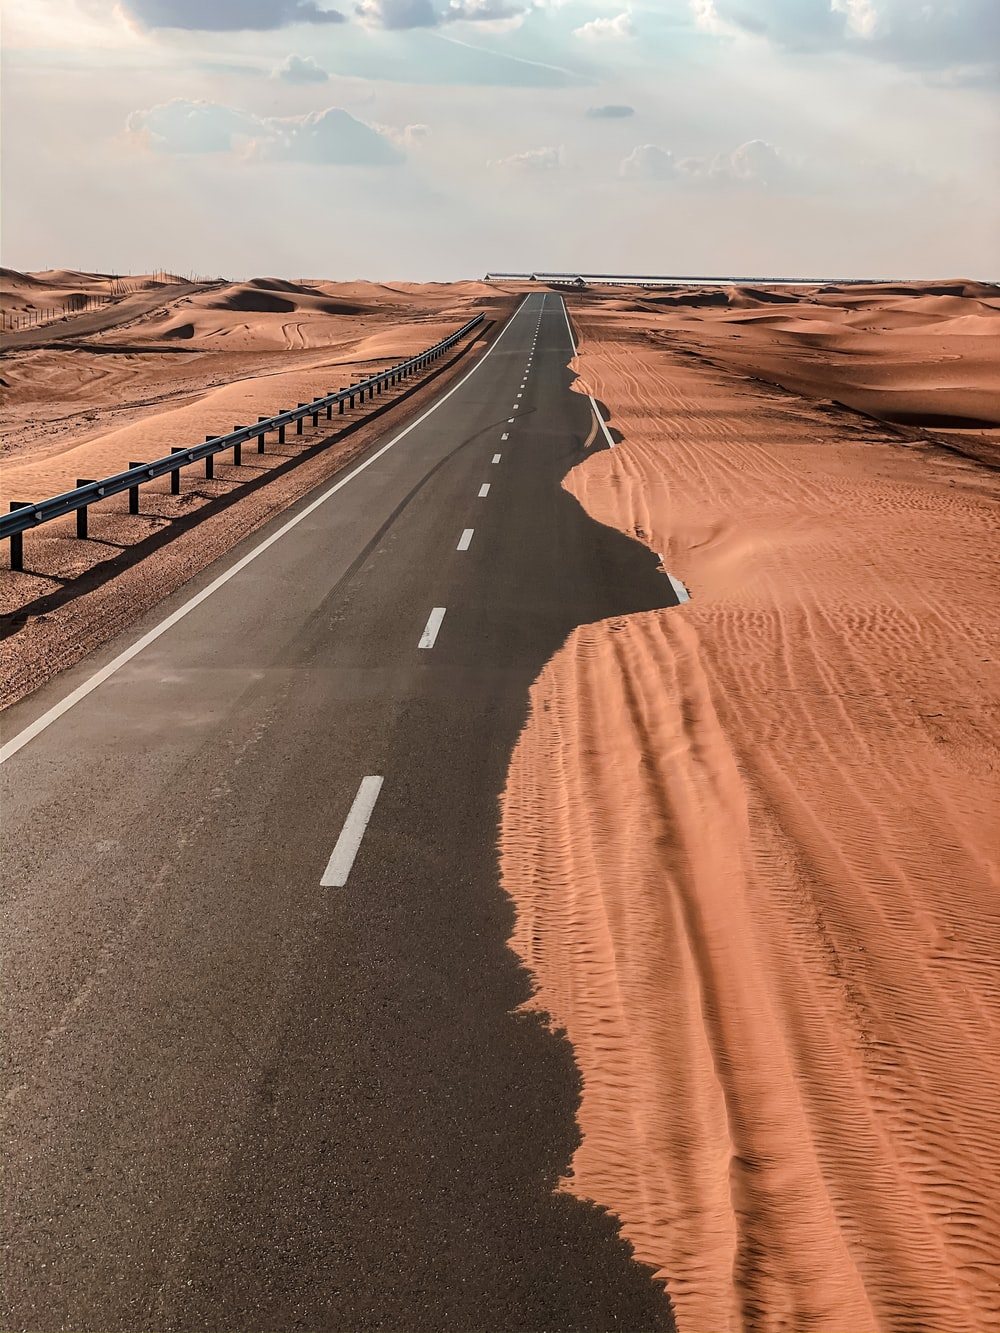 black asphalt road in the middle of desert